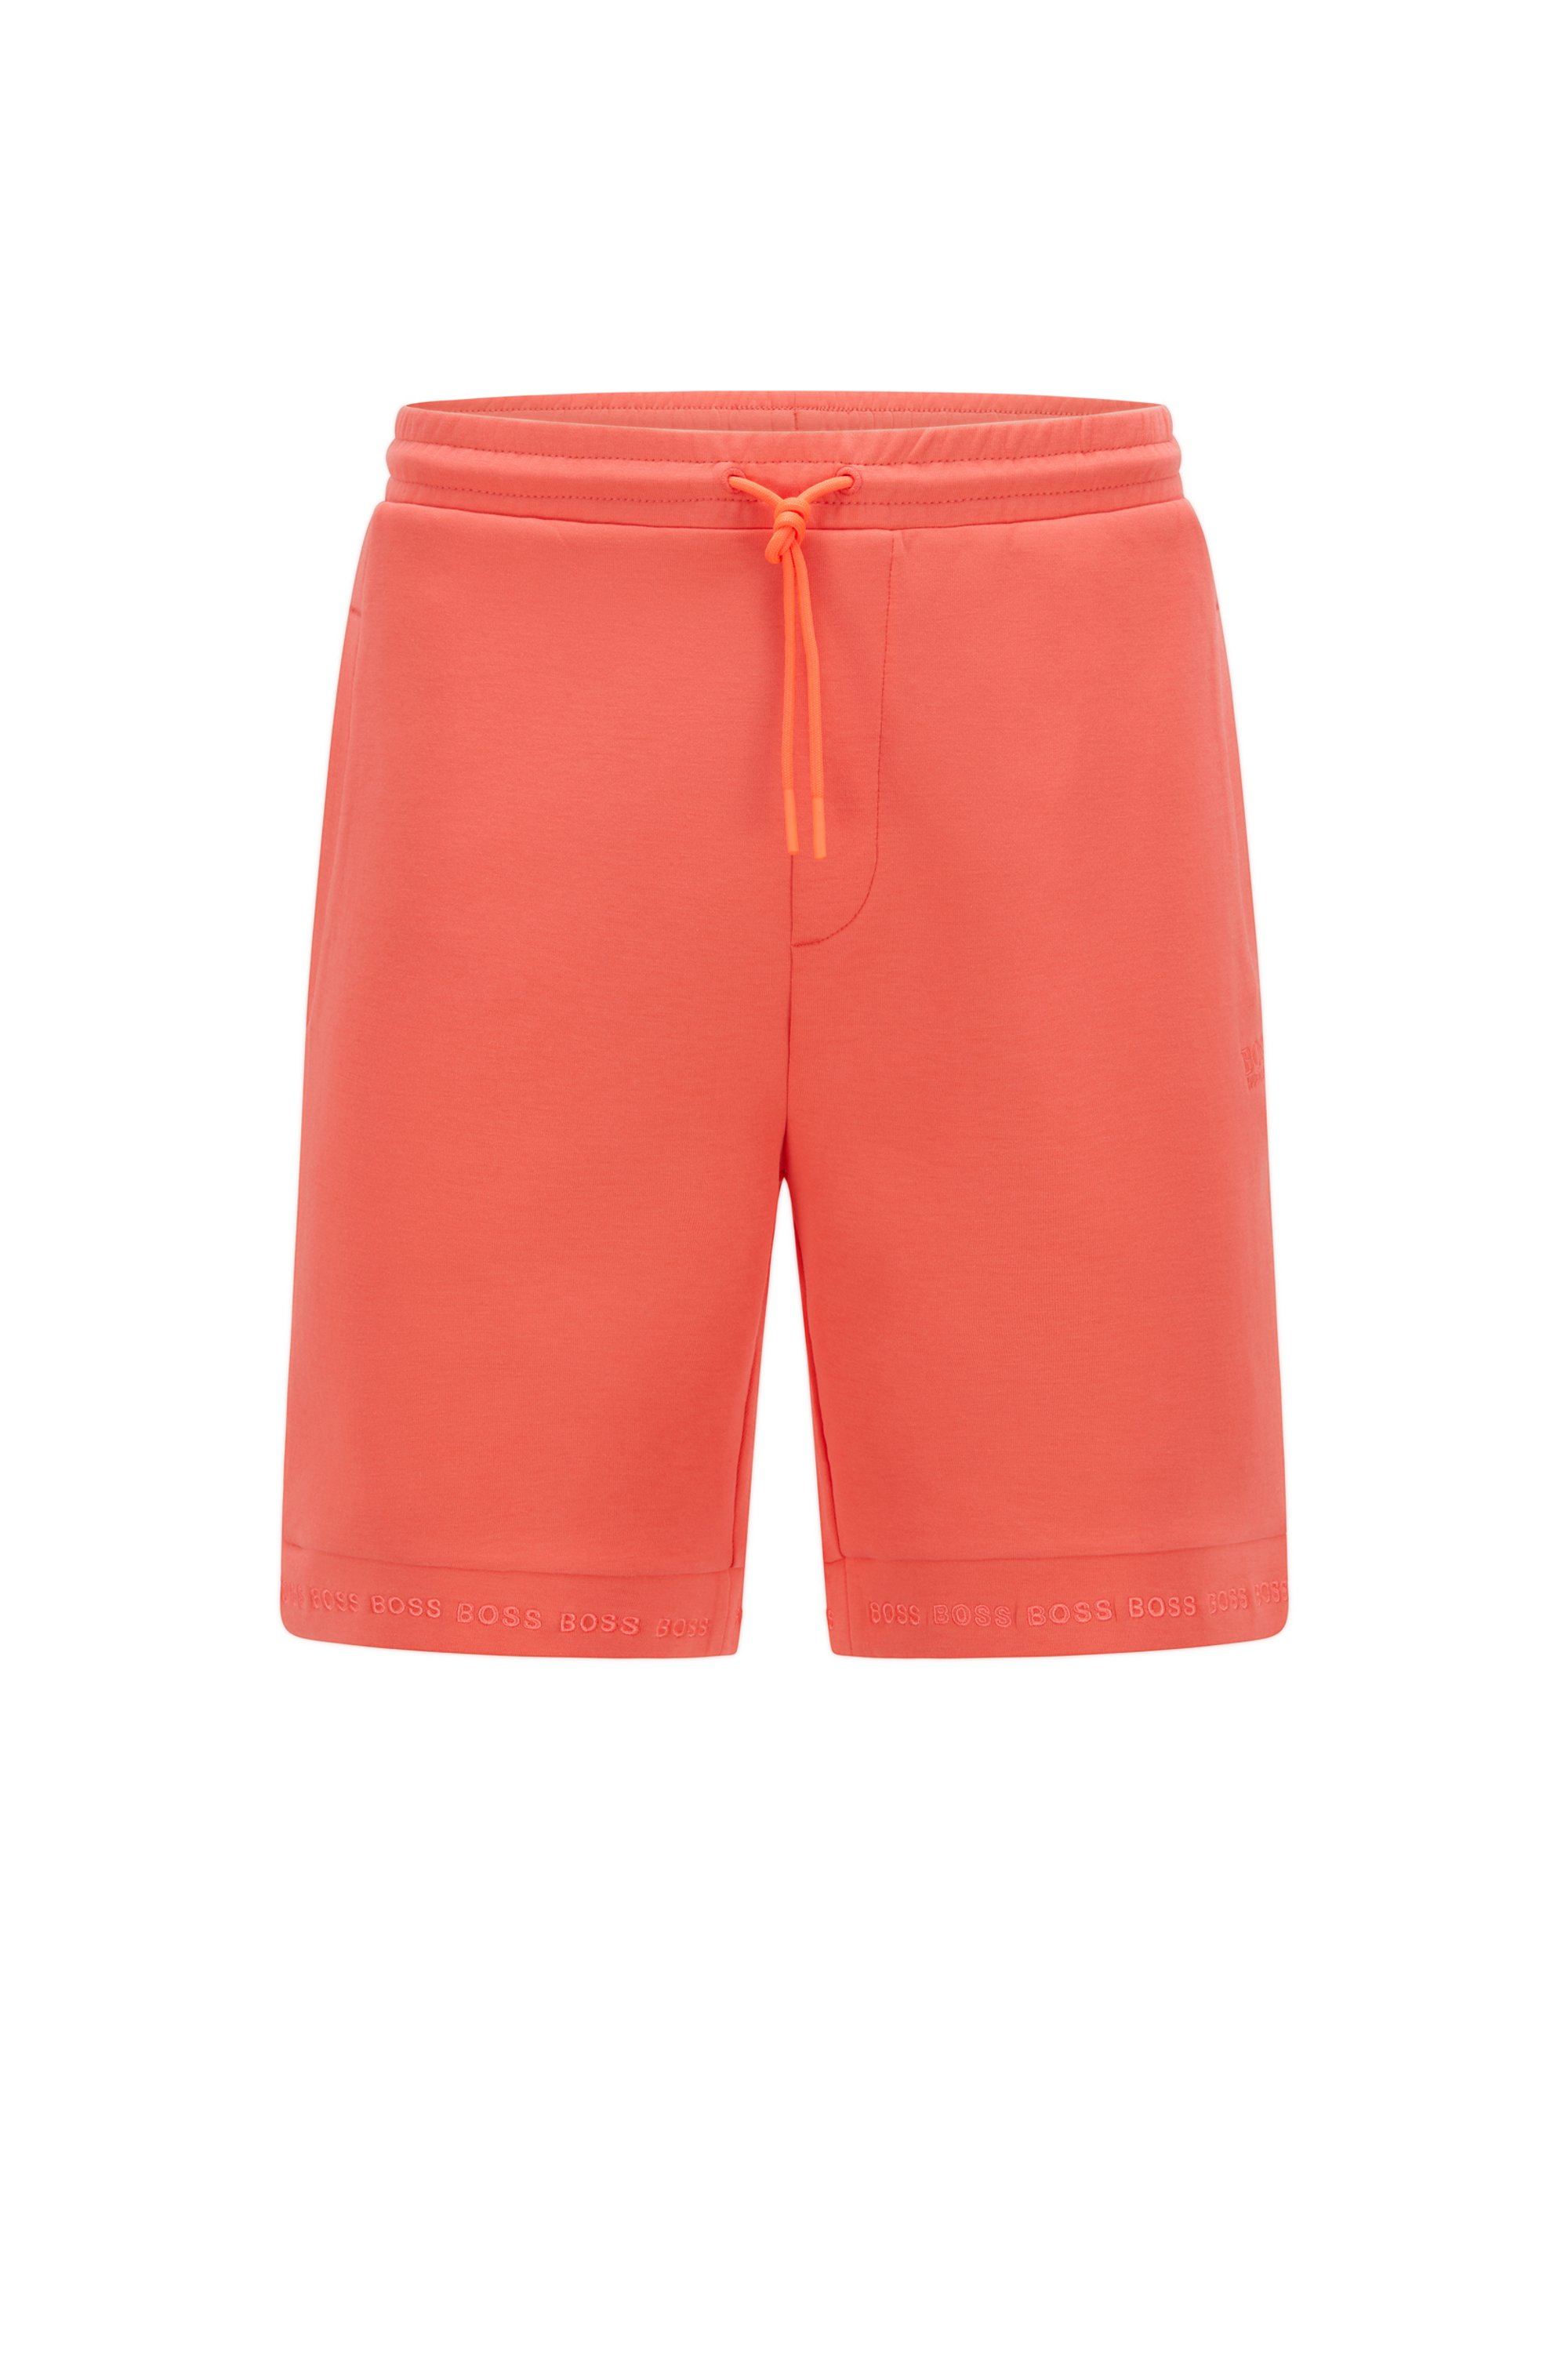 Short Regular Fit en jersey stretch avec bas des jambes à logo, Orange